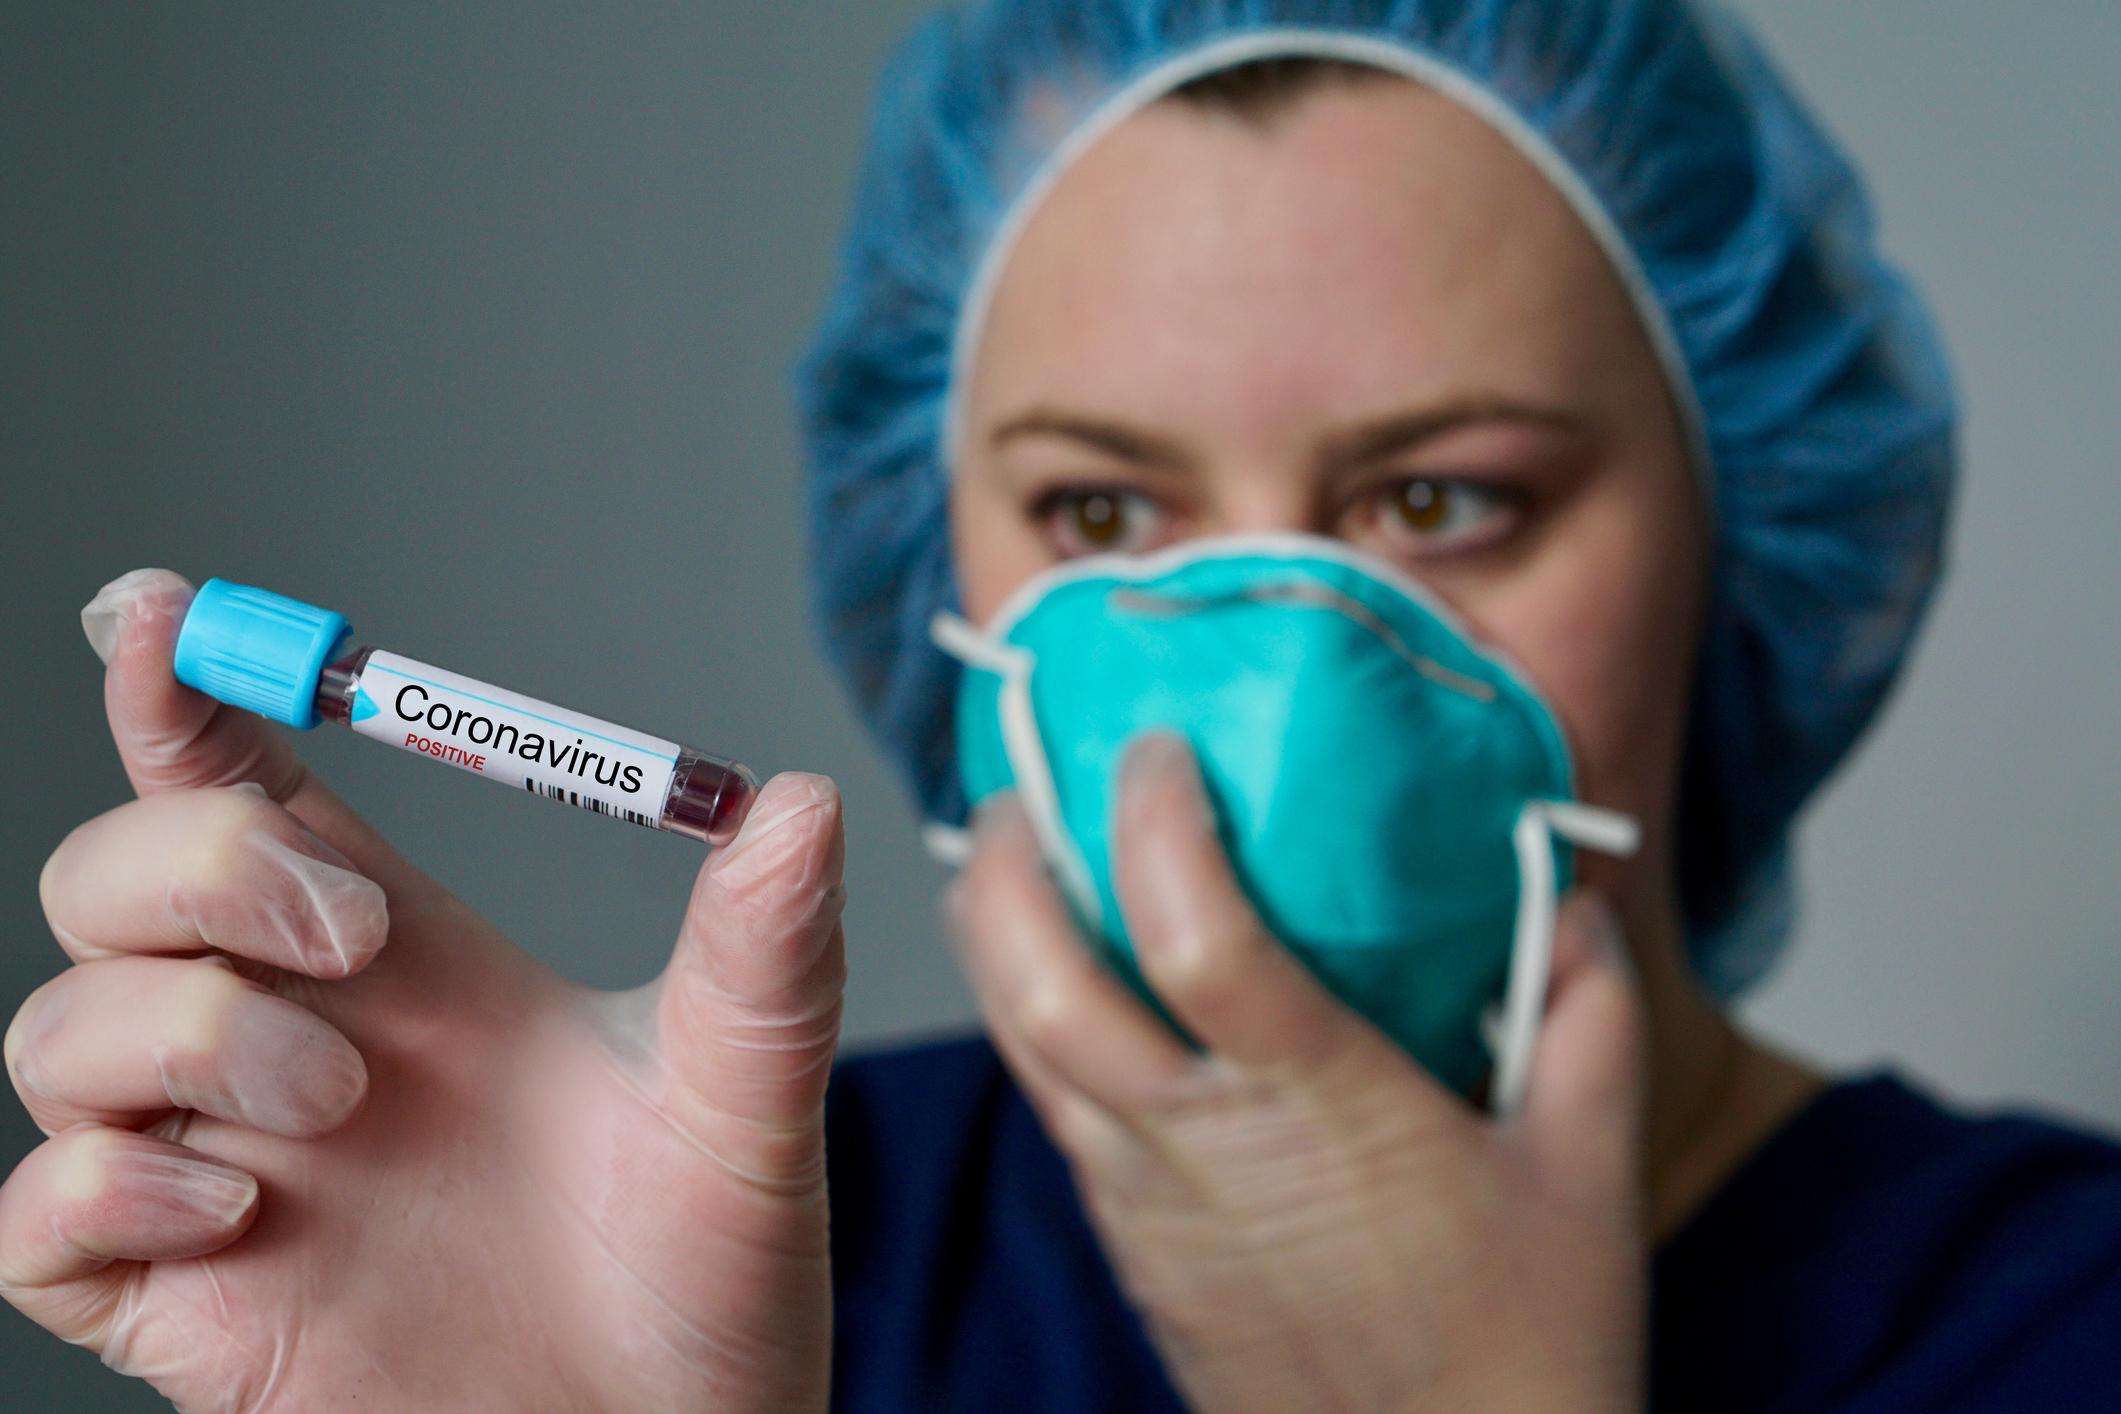 Why Inovio Pharmaceuticals Is a Top Stock to Watch Amid the Coronavirus Pandemic